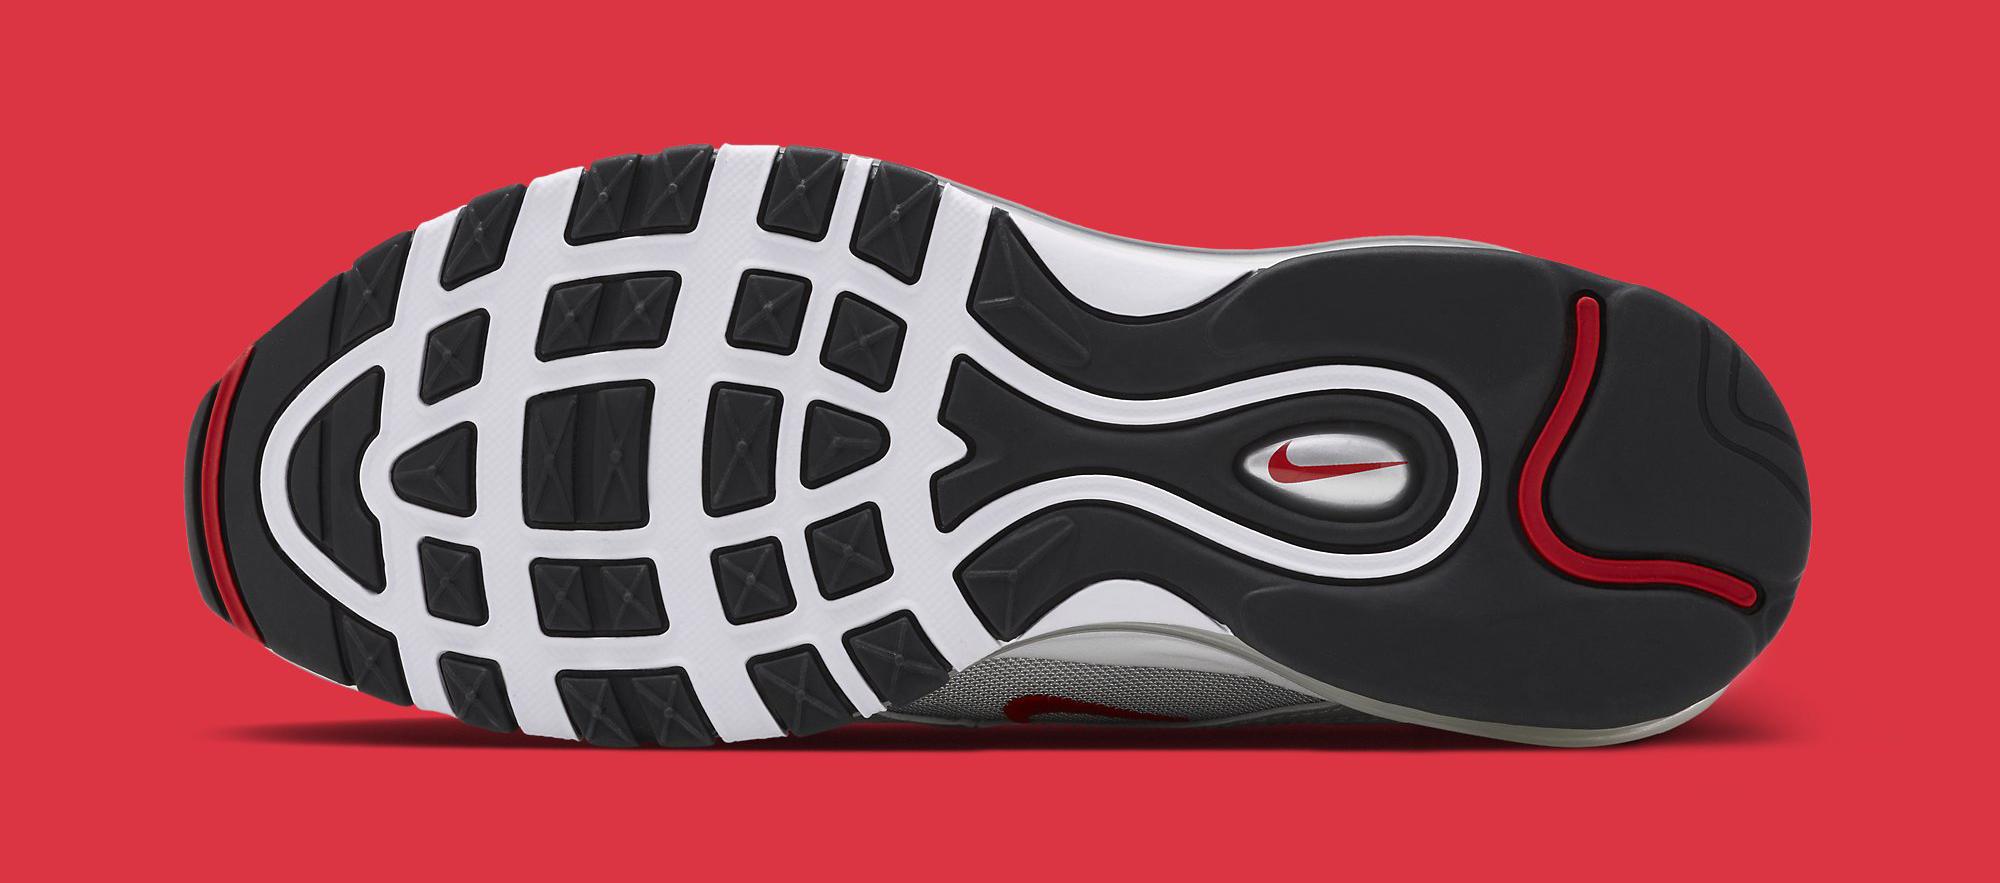 Image via Nike Silver Nike Air Max 97 884421-001 Sole